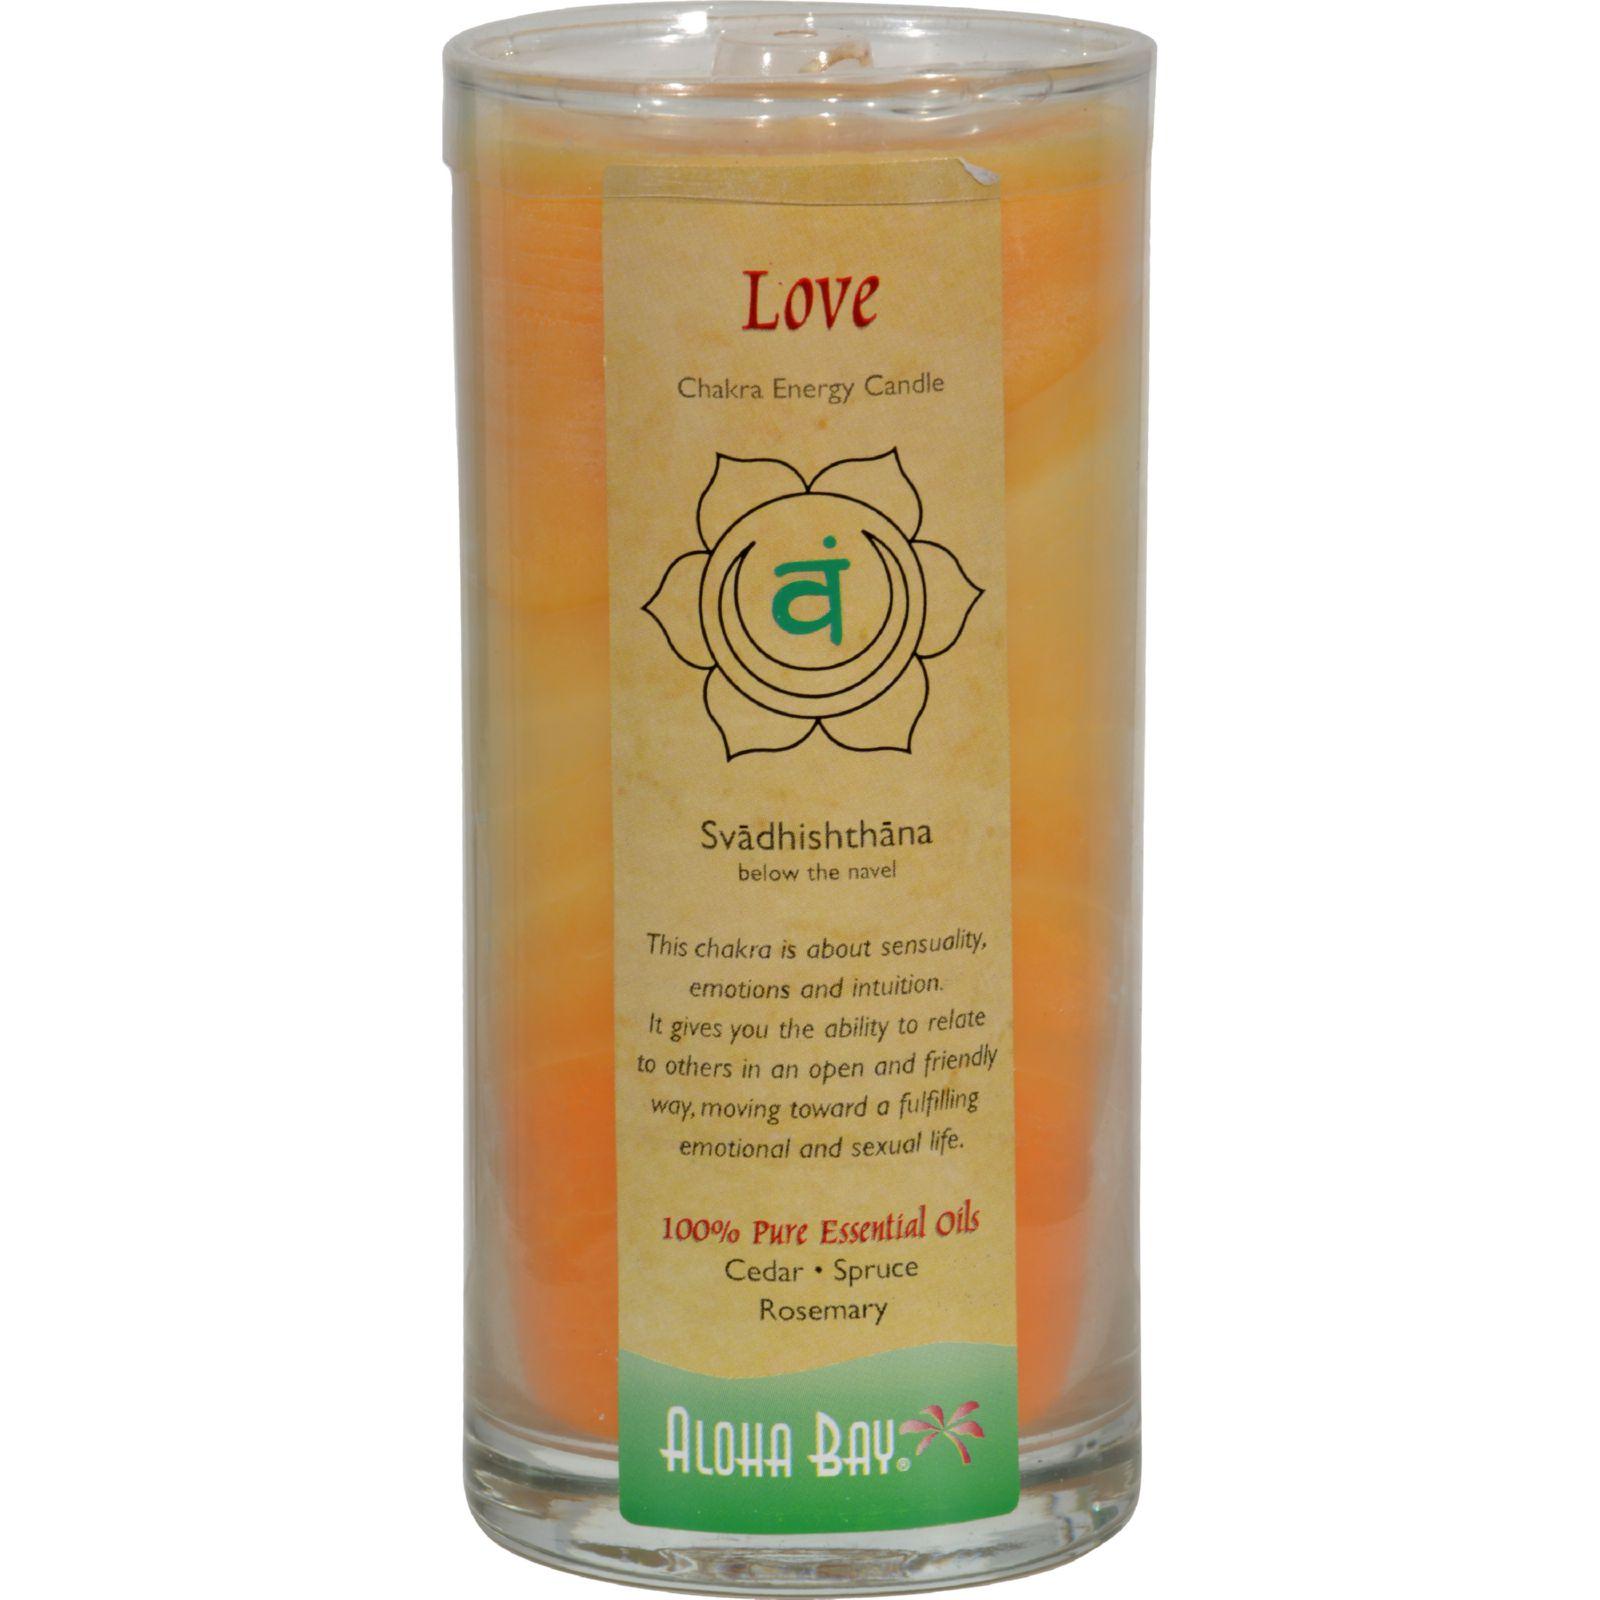 Aloha Bay - Chakra Energy Candle Jar Love - 11 oz.